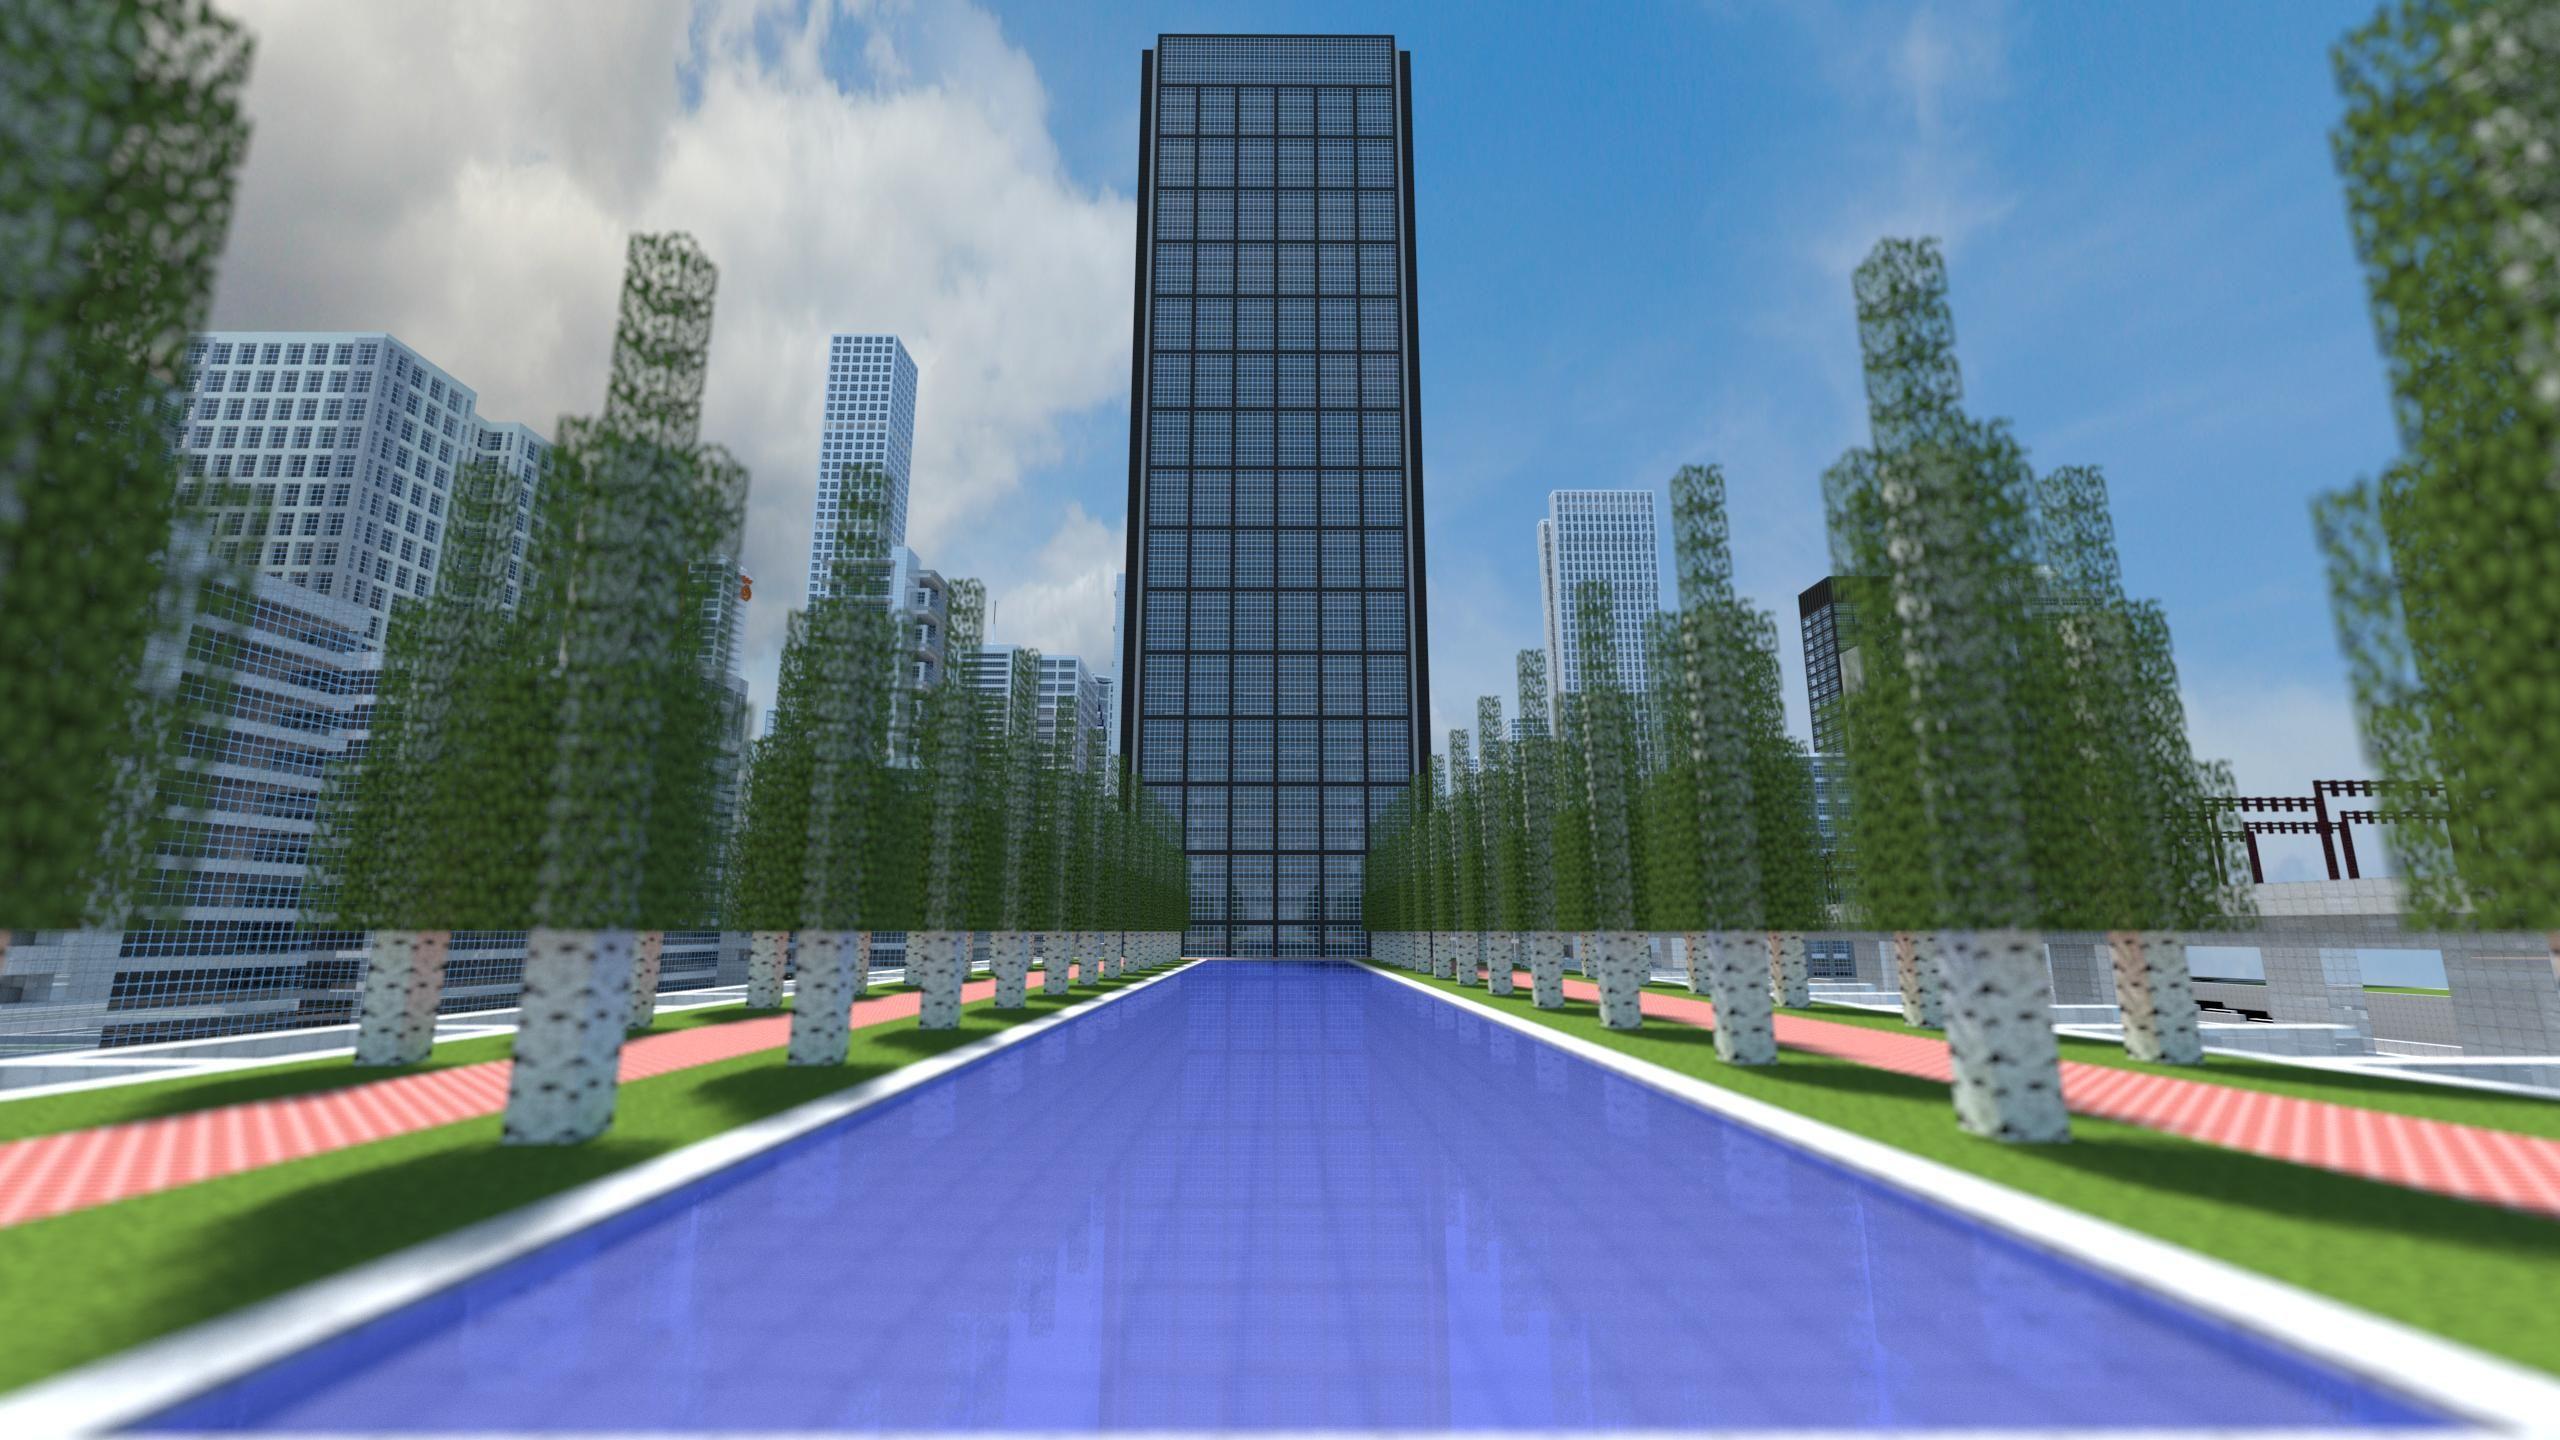 Minecraft cities minecraft city plaza Minecraft